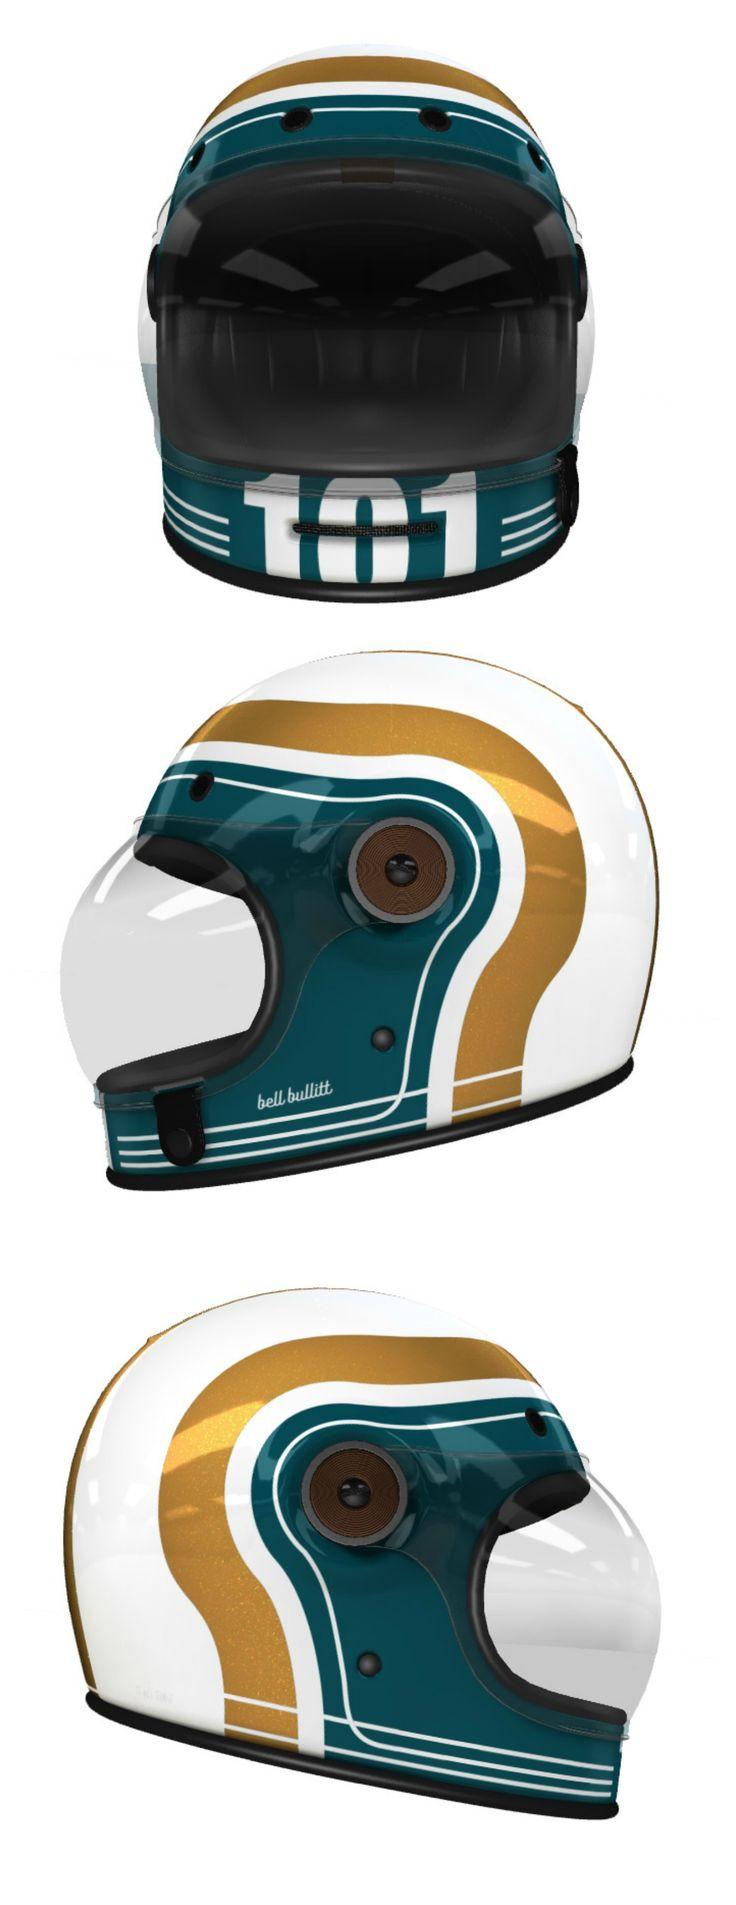 Custom Bell Bullitt Motorcycle Helmet Design at Helmade